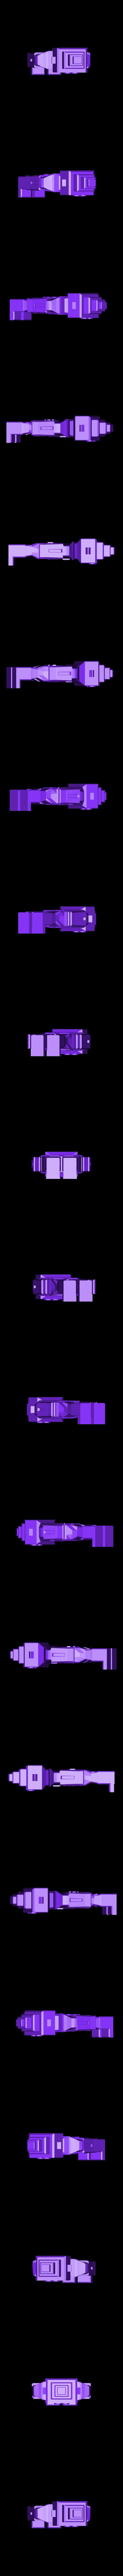 3d-fabric-jean-pierre_fat_the_robot.obj Download OBJ file Fat Fat the robot • 3D printable template, 3d-fabric-jean-pierre